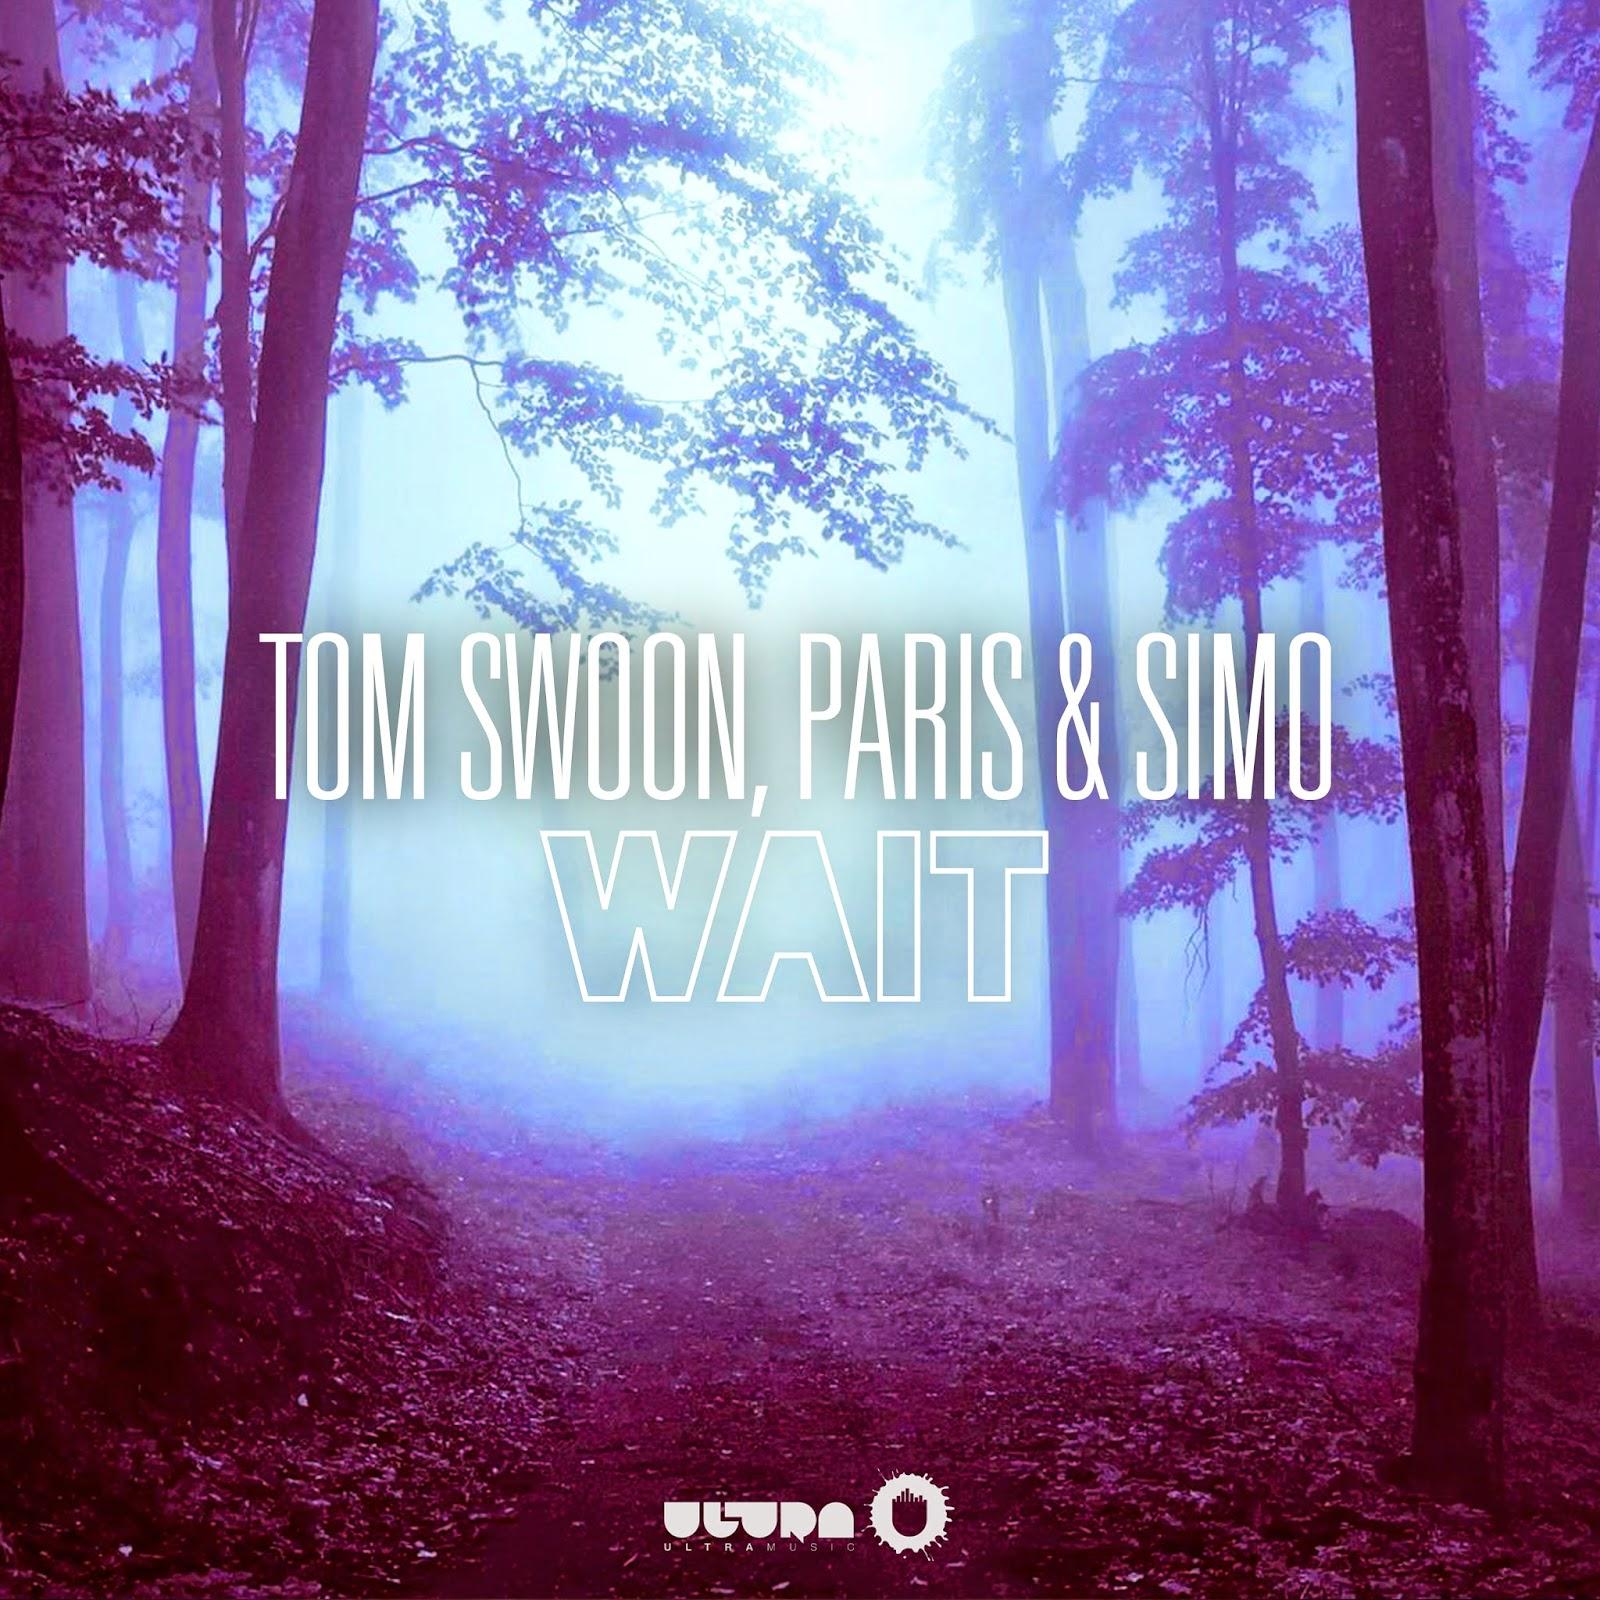 Tom Swoon, Paris & Simo - Wait (Original Mix) - YouTube